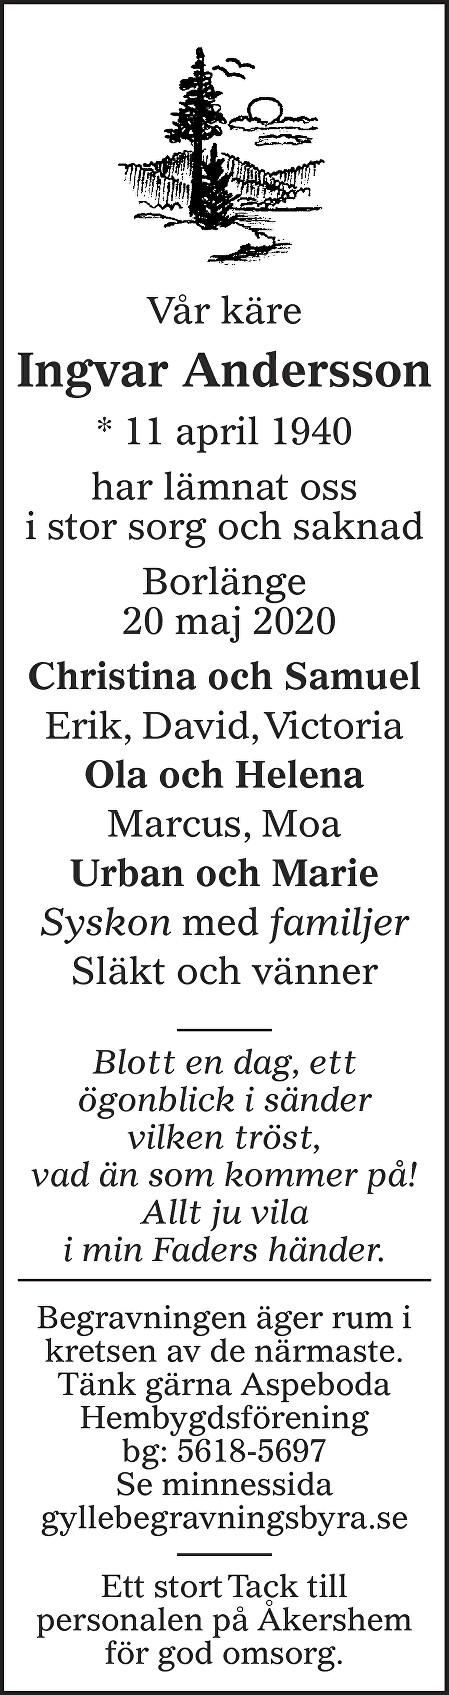 Ingvar Andersson Death notice